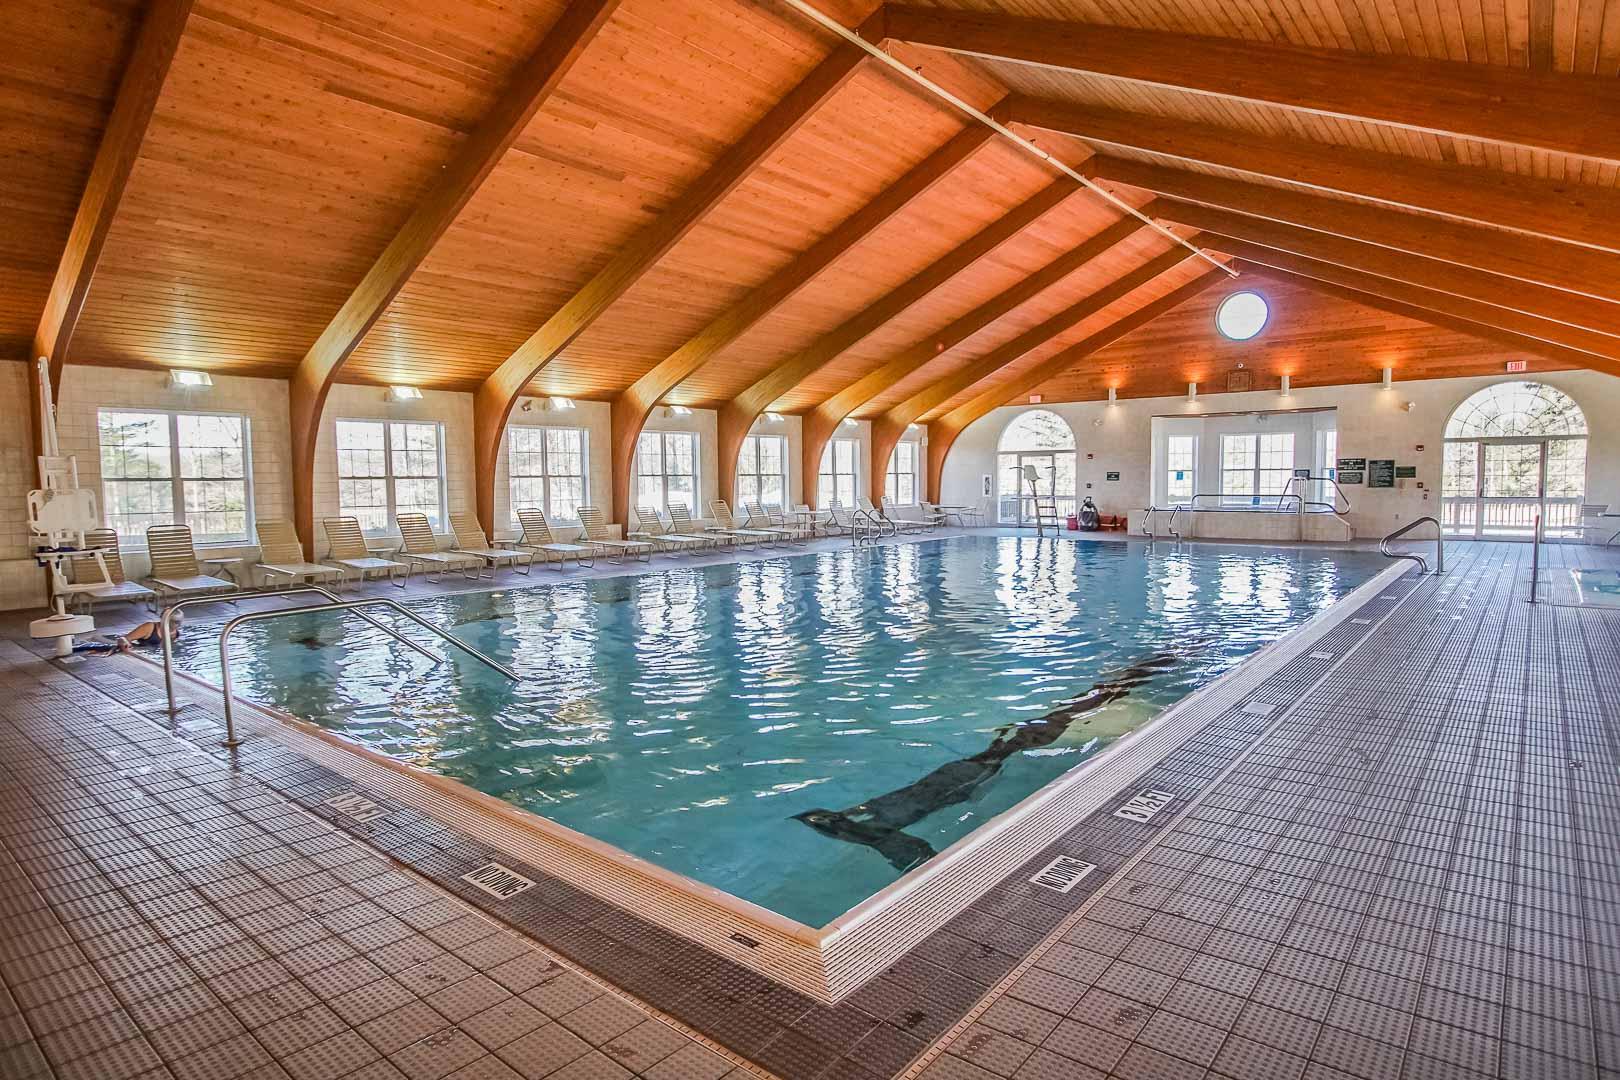 A refreshing indoor pool at VRI's Tanglwood Resort in Pennsylvania.